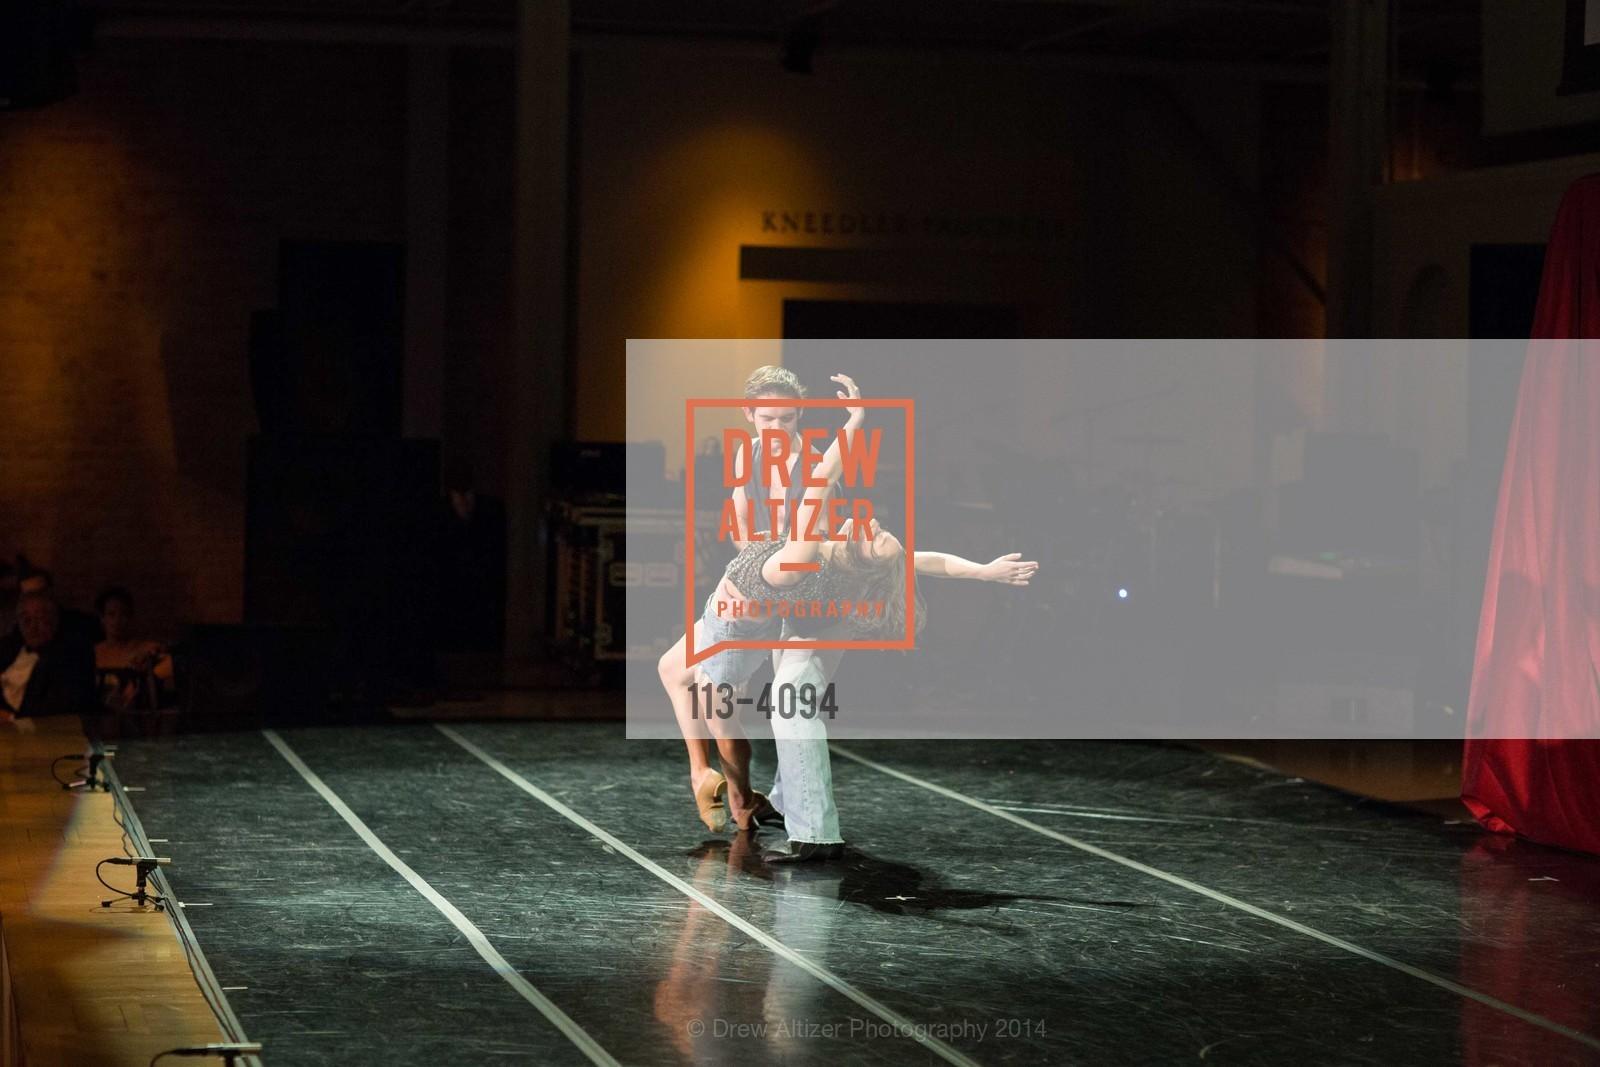 Performance, Photo #113-4094